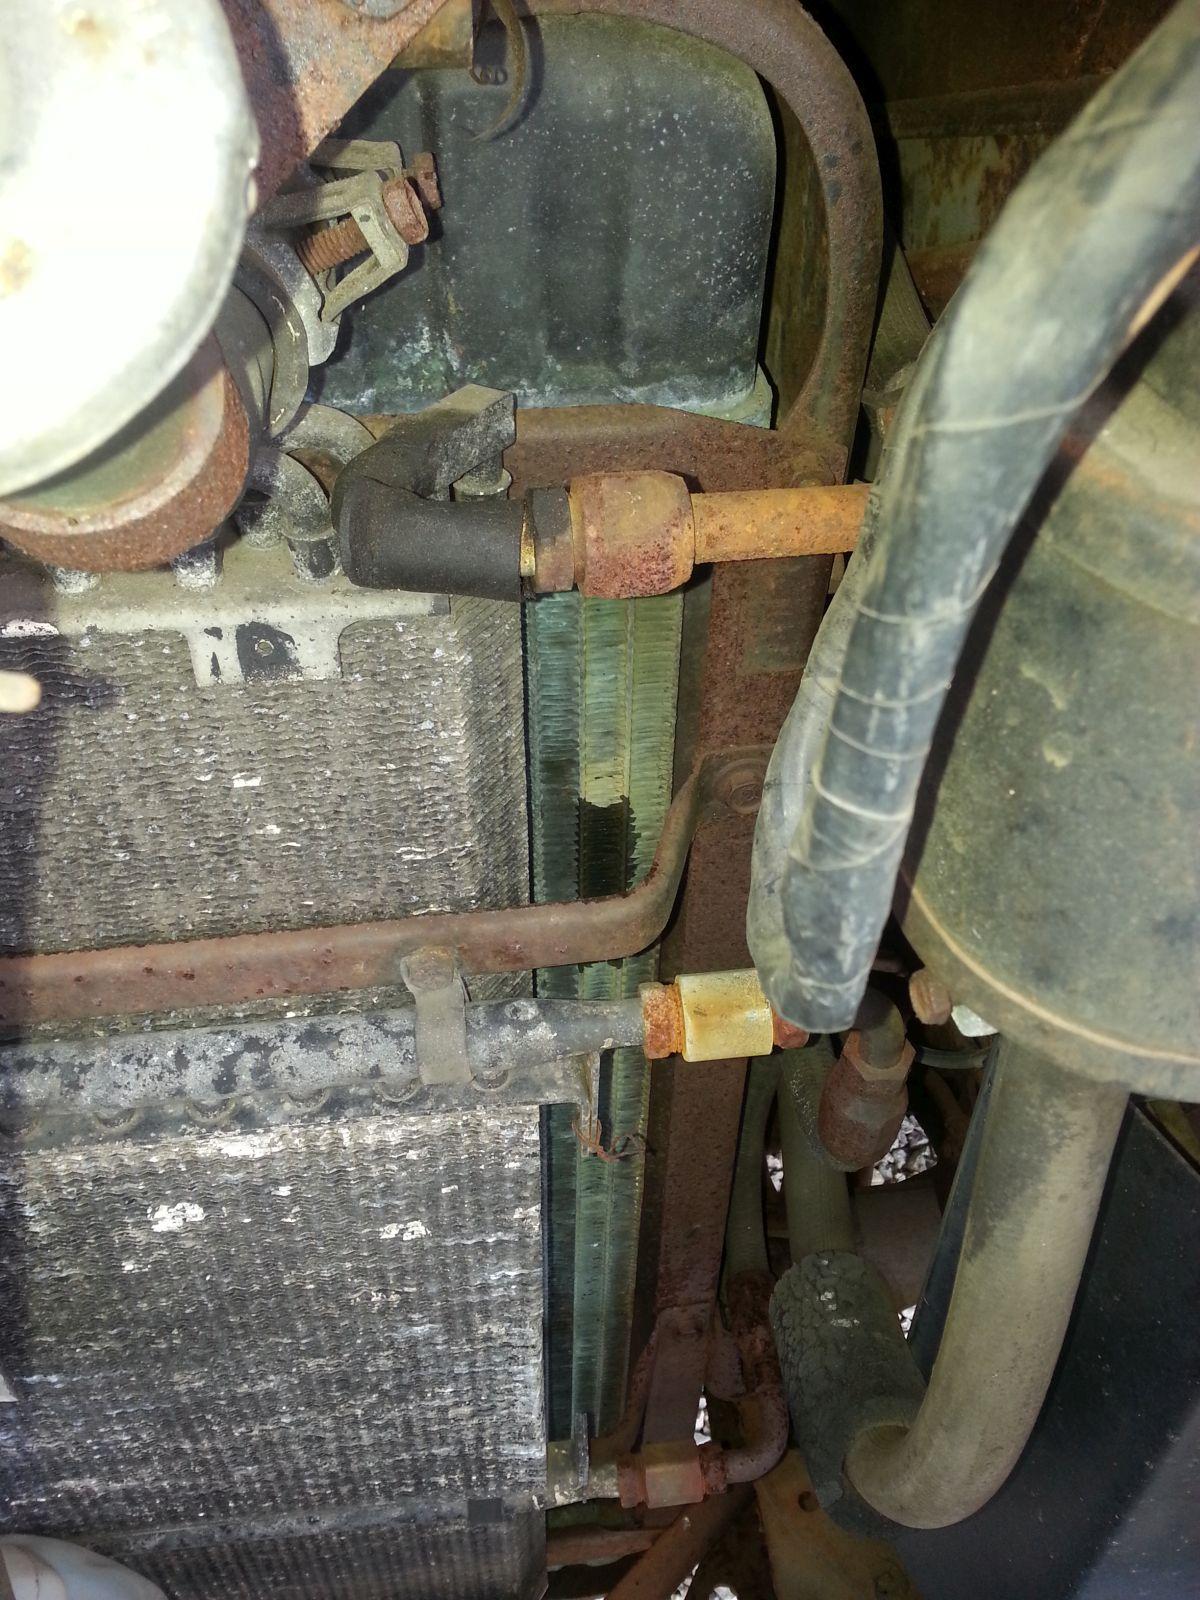 Click image for larger version  Name:peanut-radiator.jpg Views:81 Size:347.4 KB ID:259890